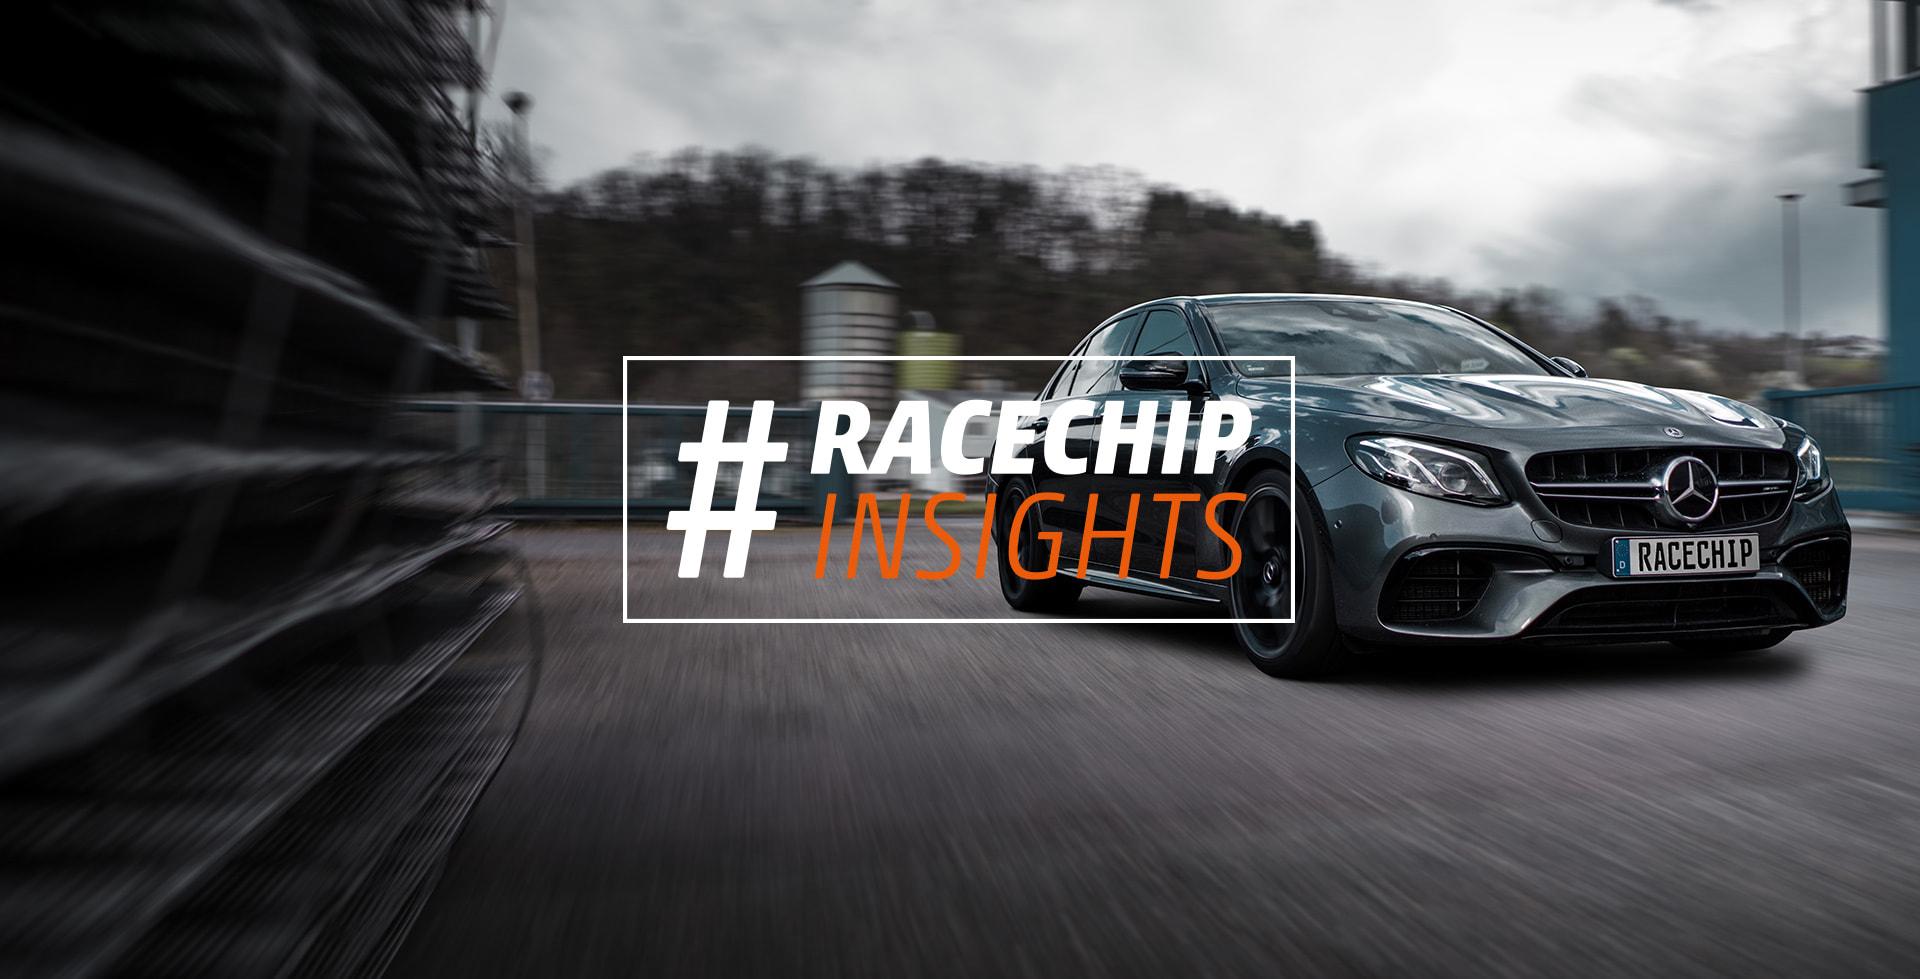 Neues RaceChip Showcar: Kompaktsportler mit Renncharakter